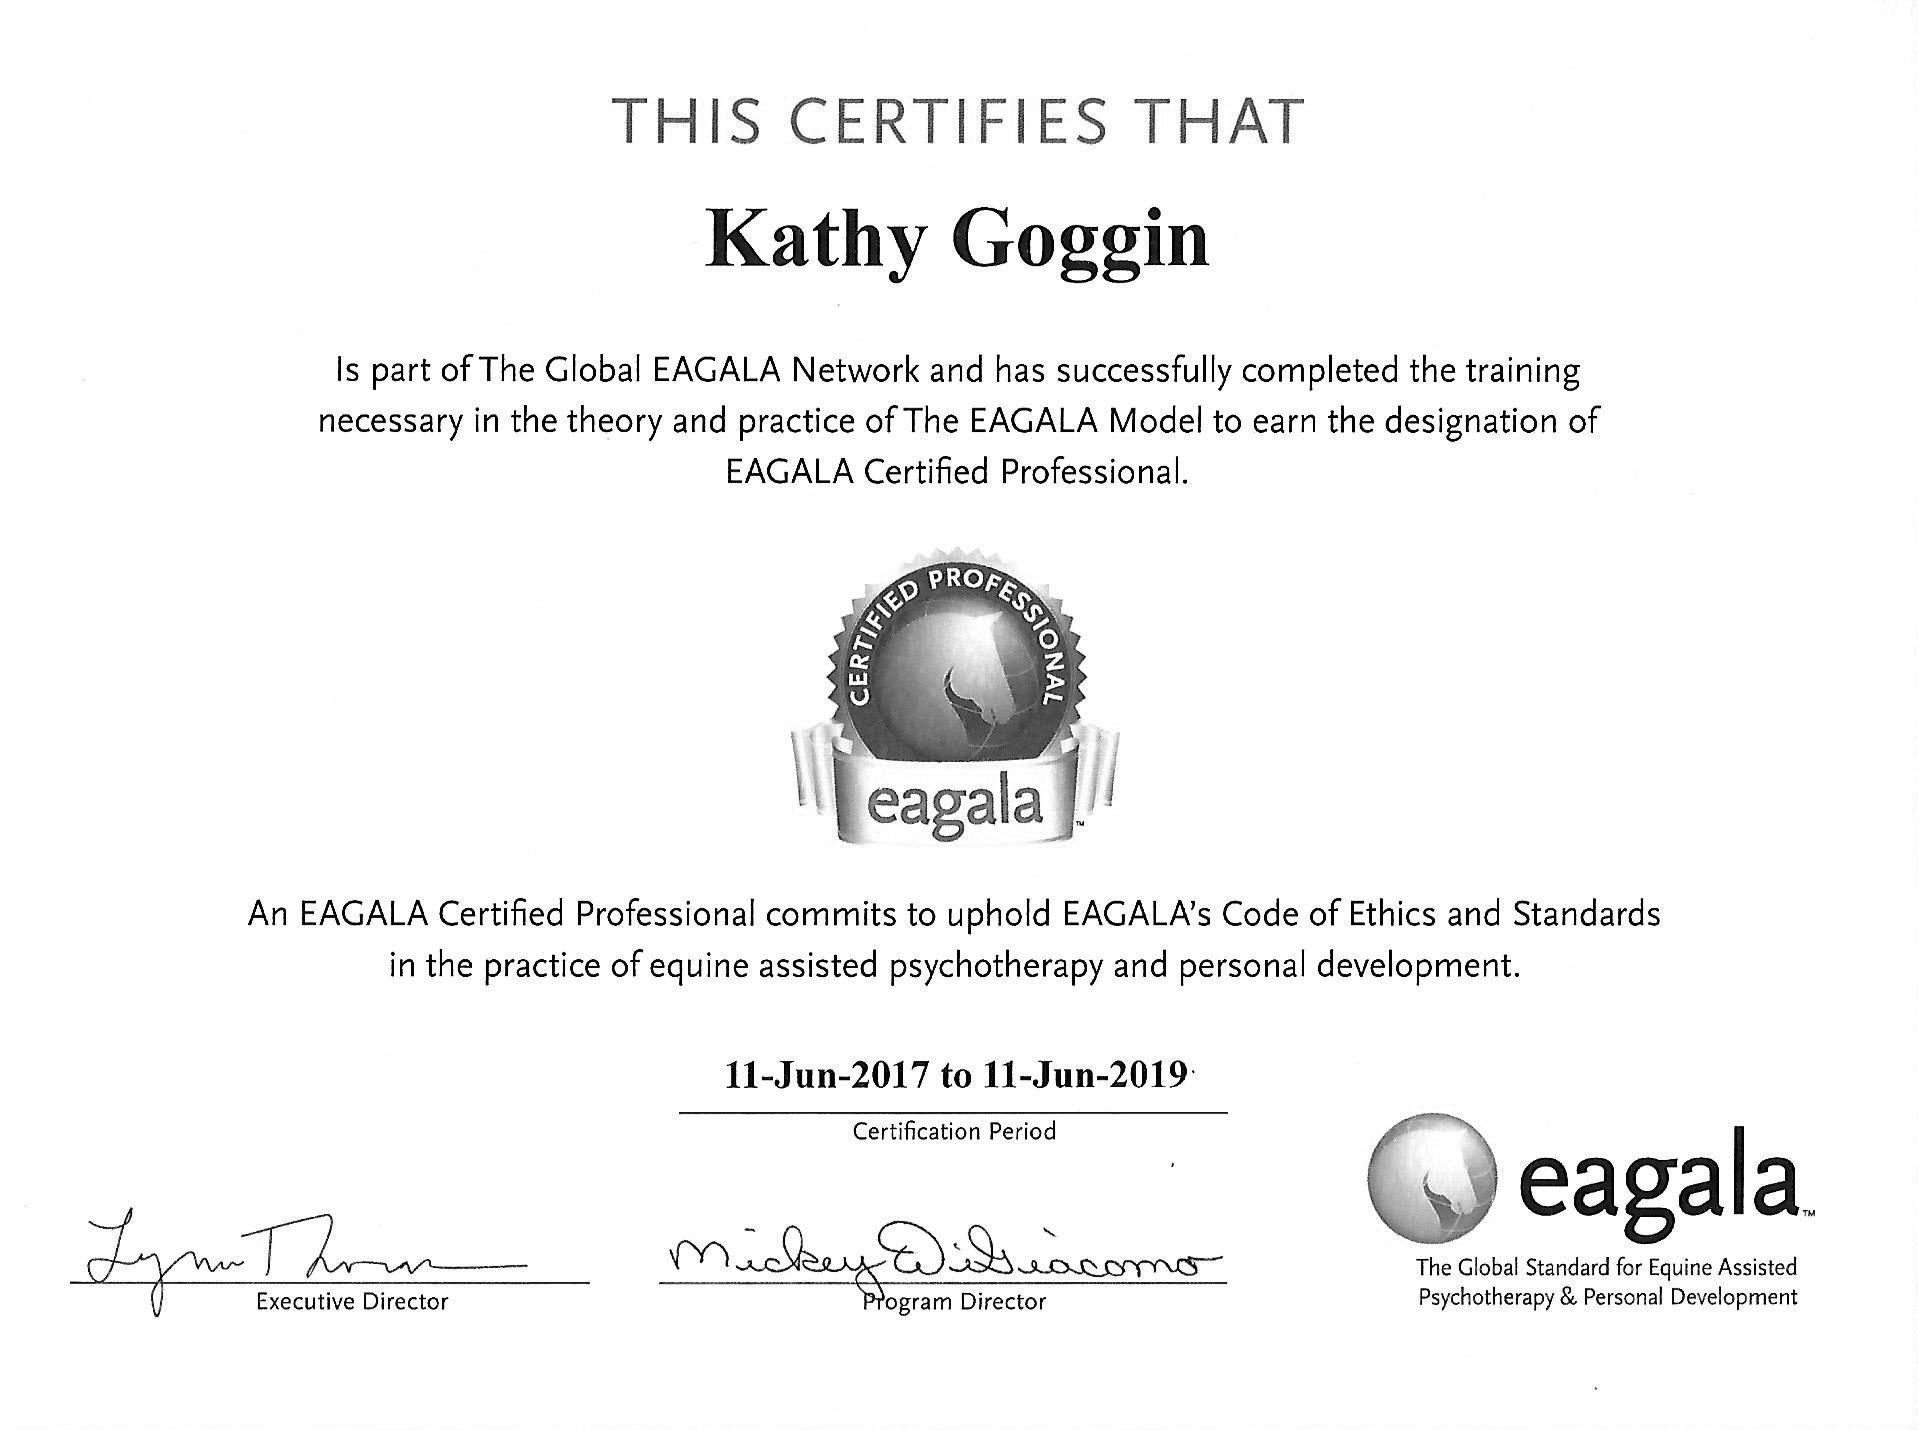 Certificate-of-Achievement-EAGALA-Kathy-goggin